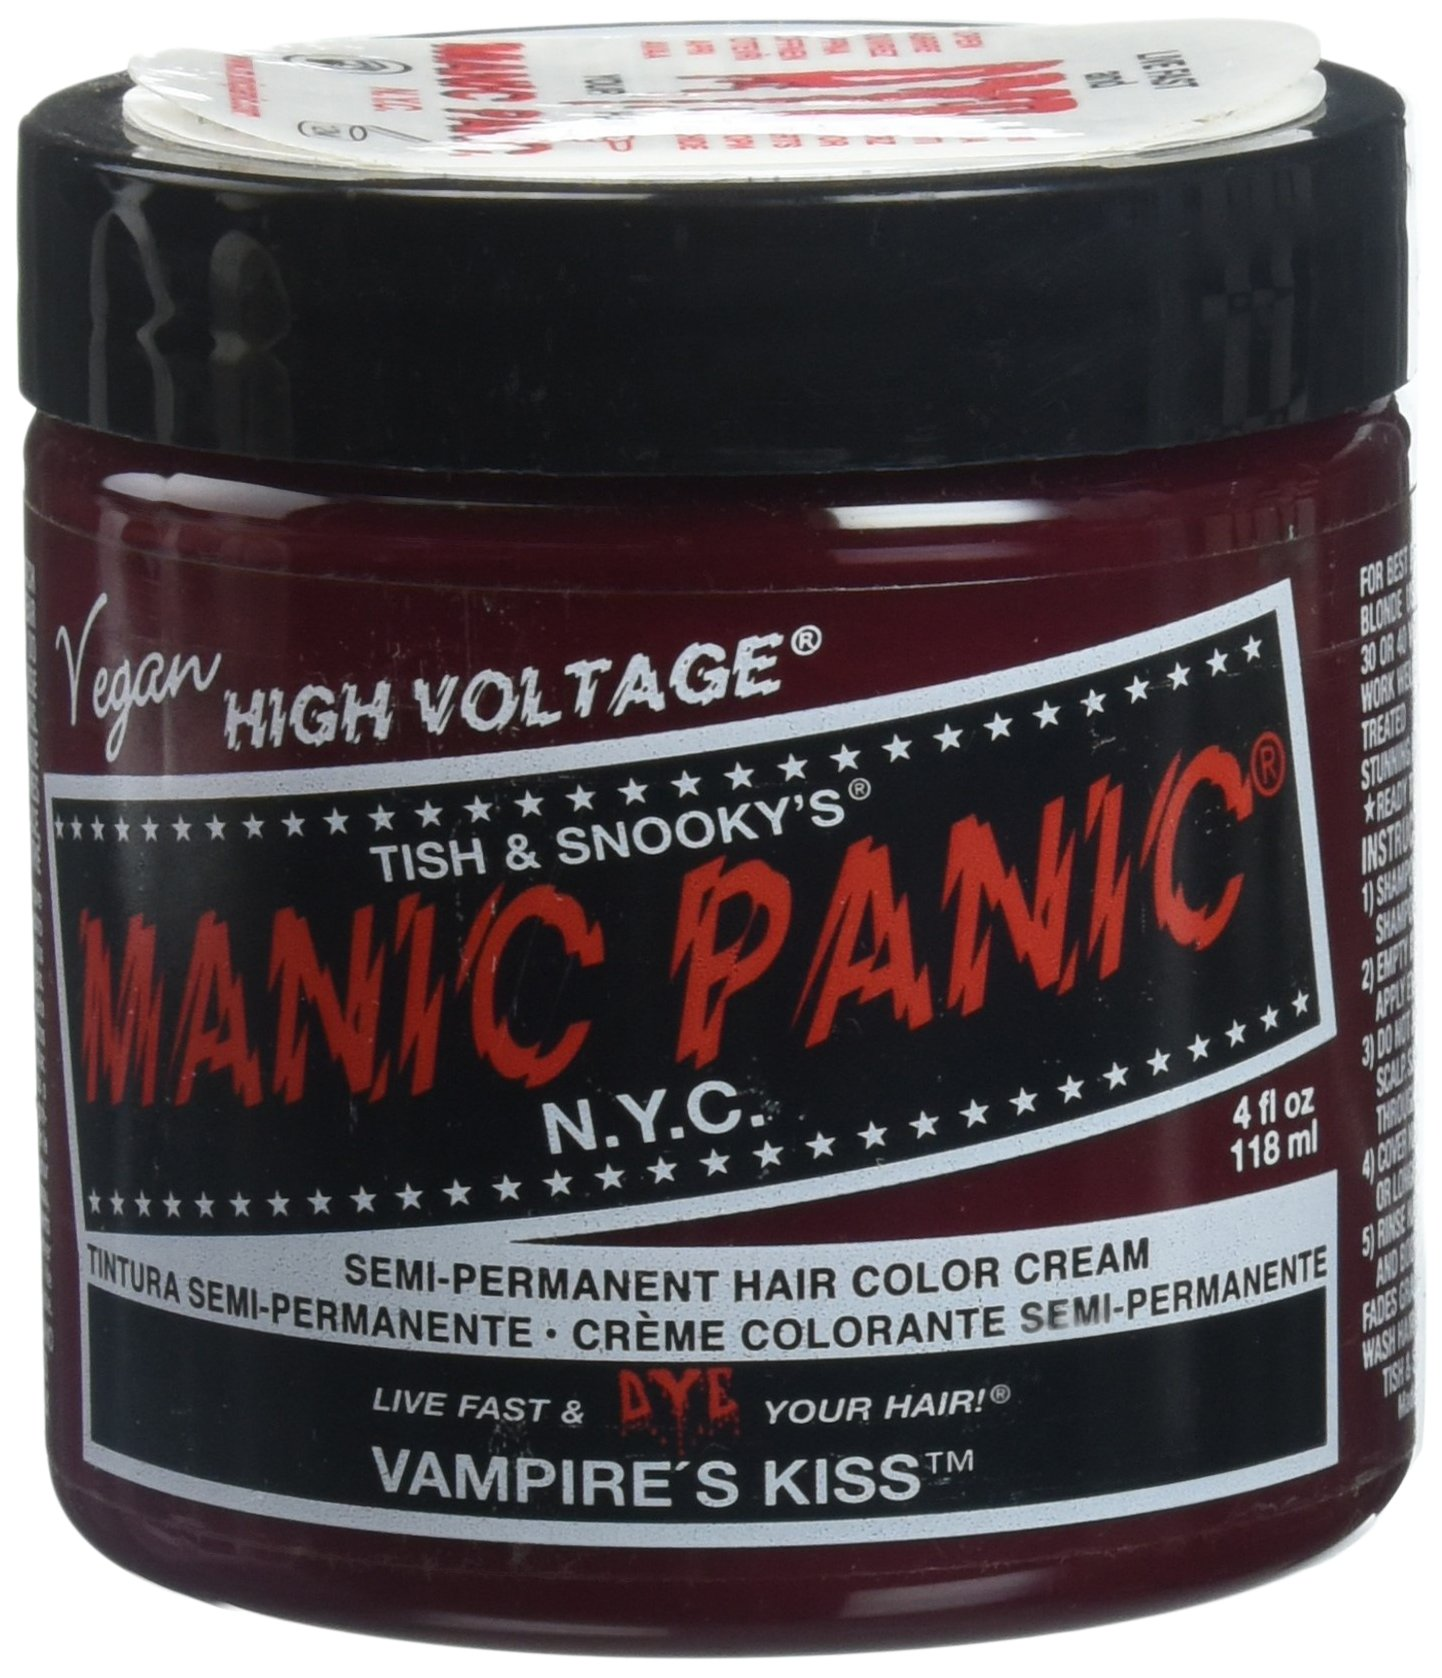 MANIC PANIC CLASSIC VAMPIRES KISS product image